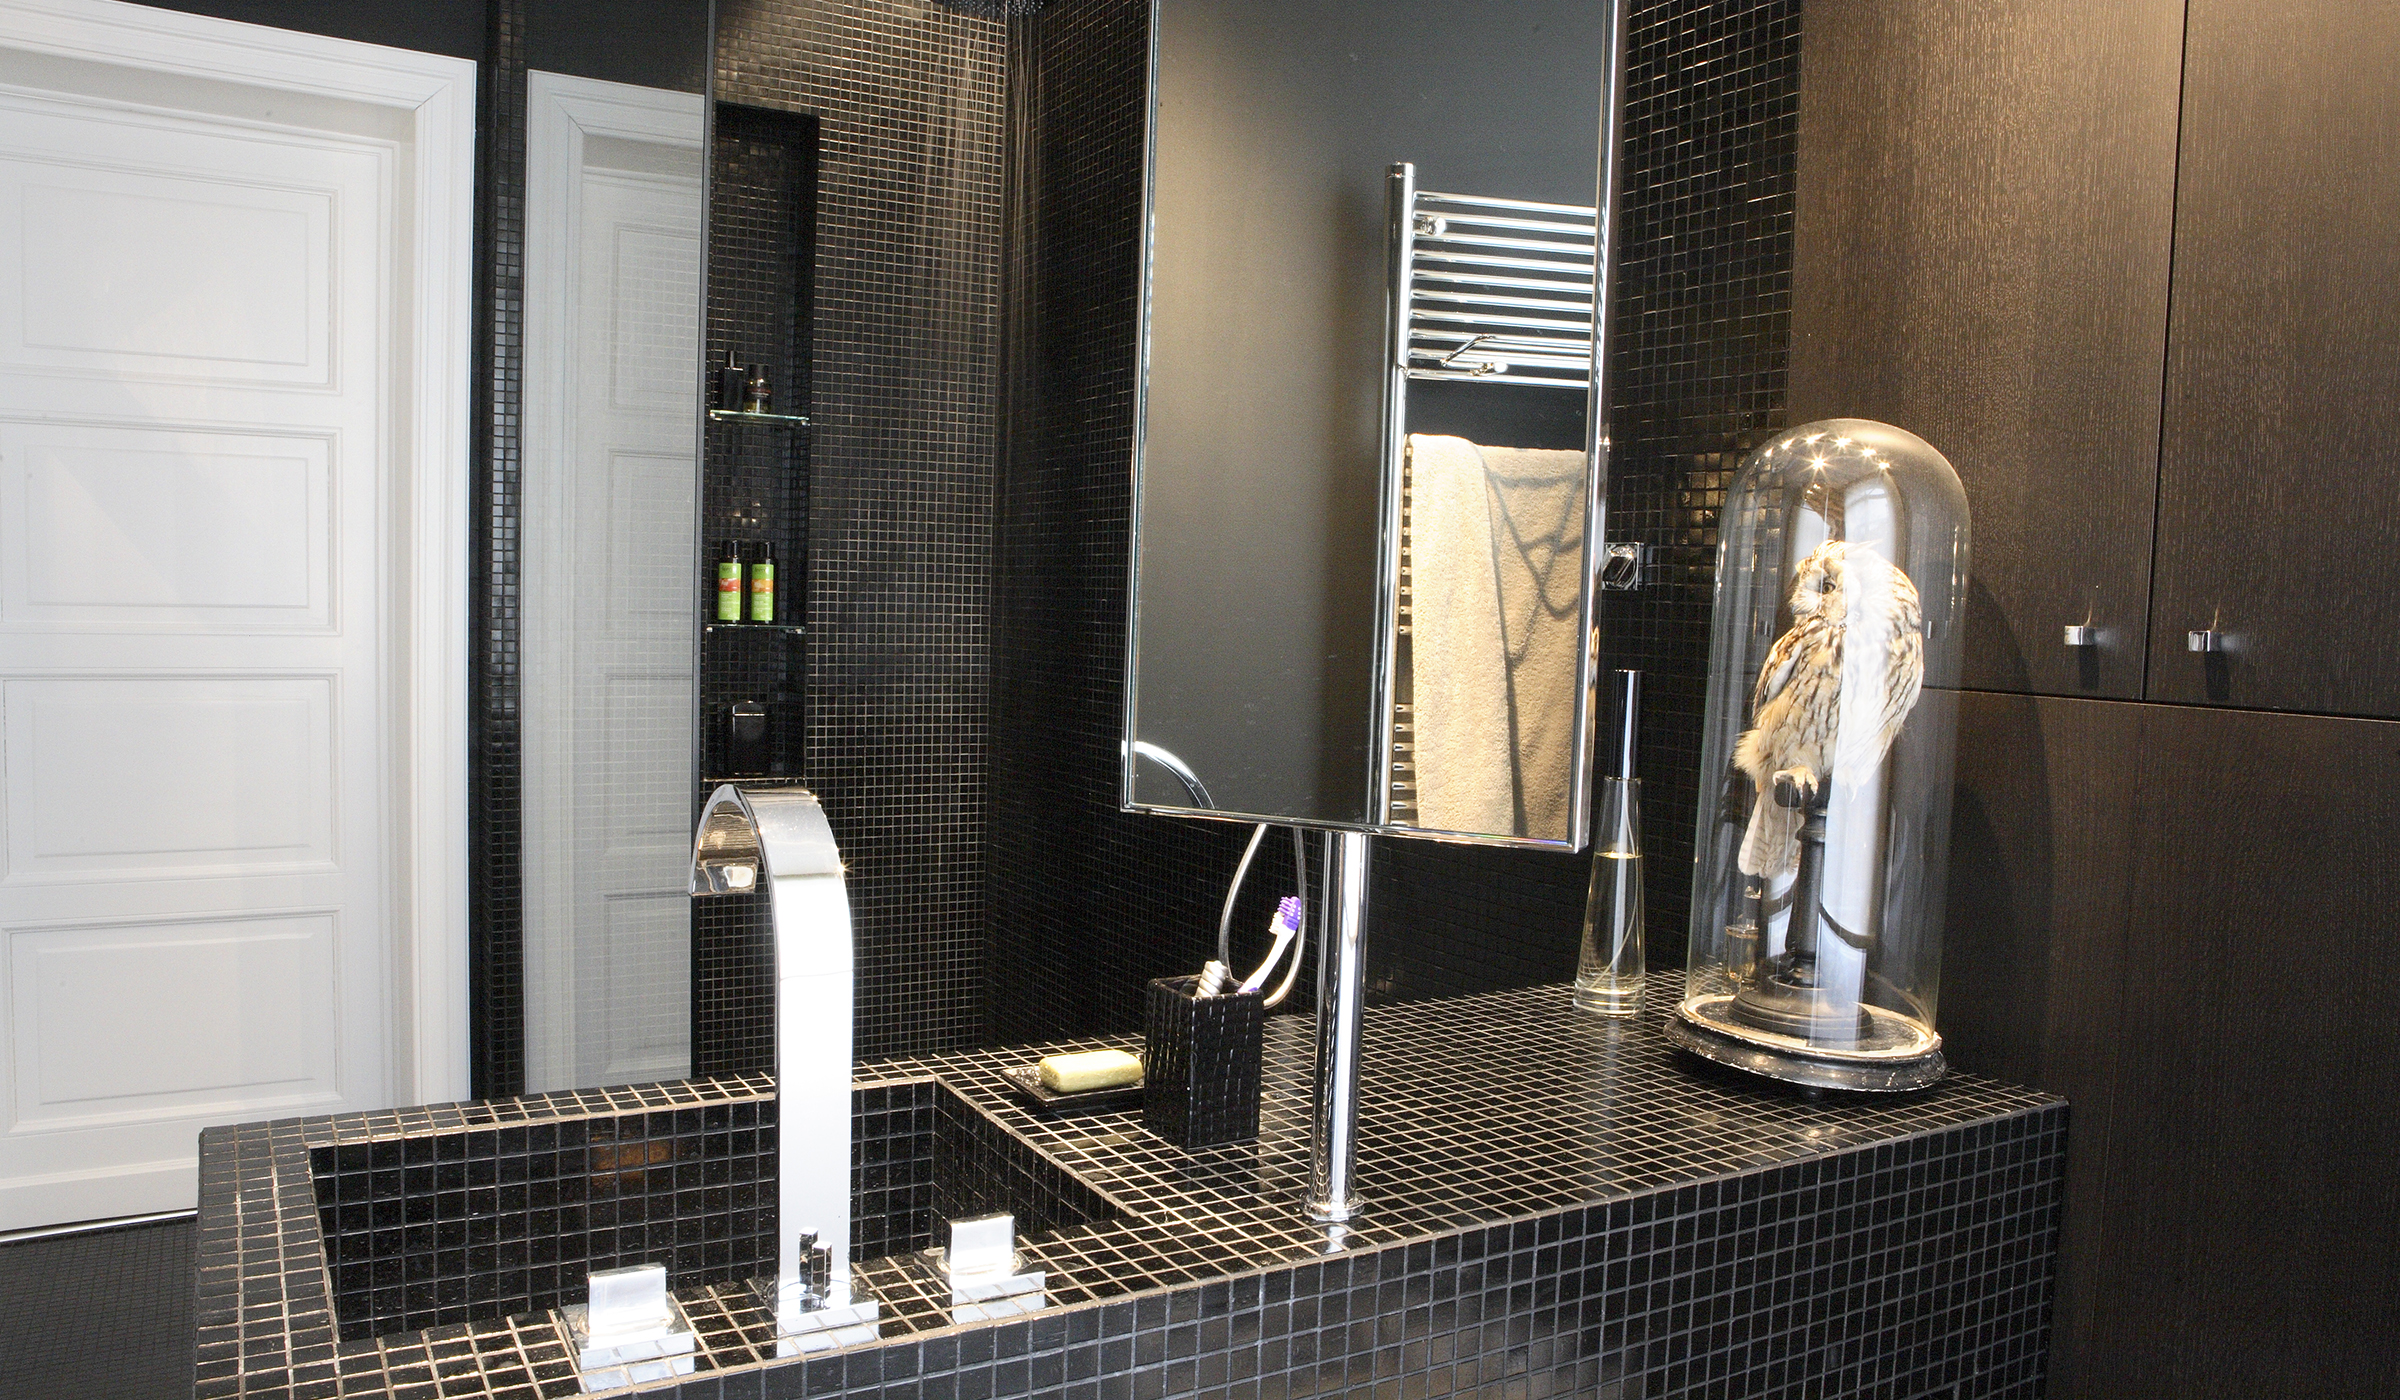 Hotel particulier bruxelles belgium guillaume da silva - Guillaume da silva ...